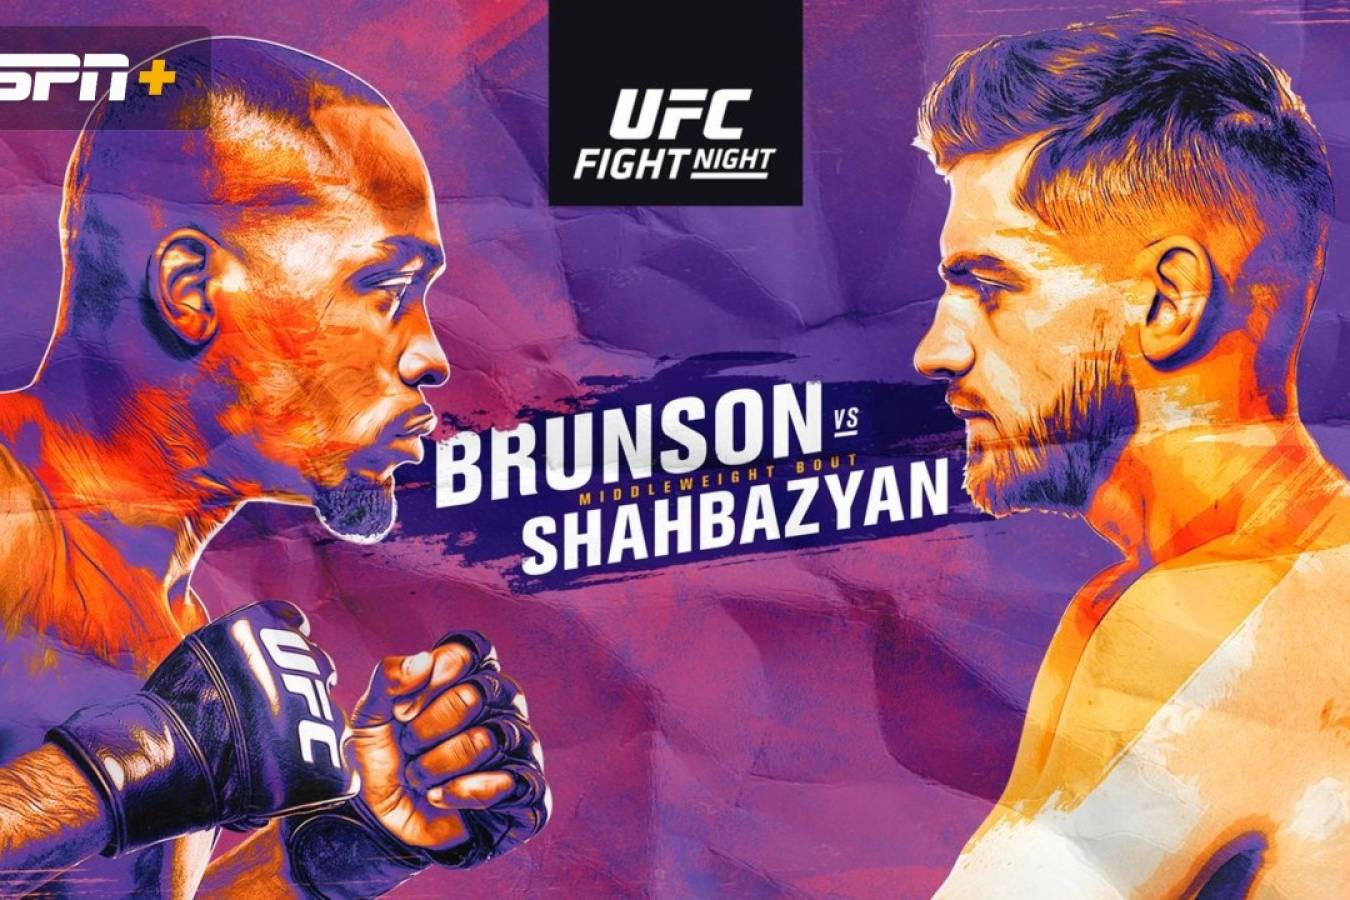 FSM Essential Preview: UFC Fight Night Brunson vs Shahbazyan